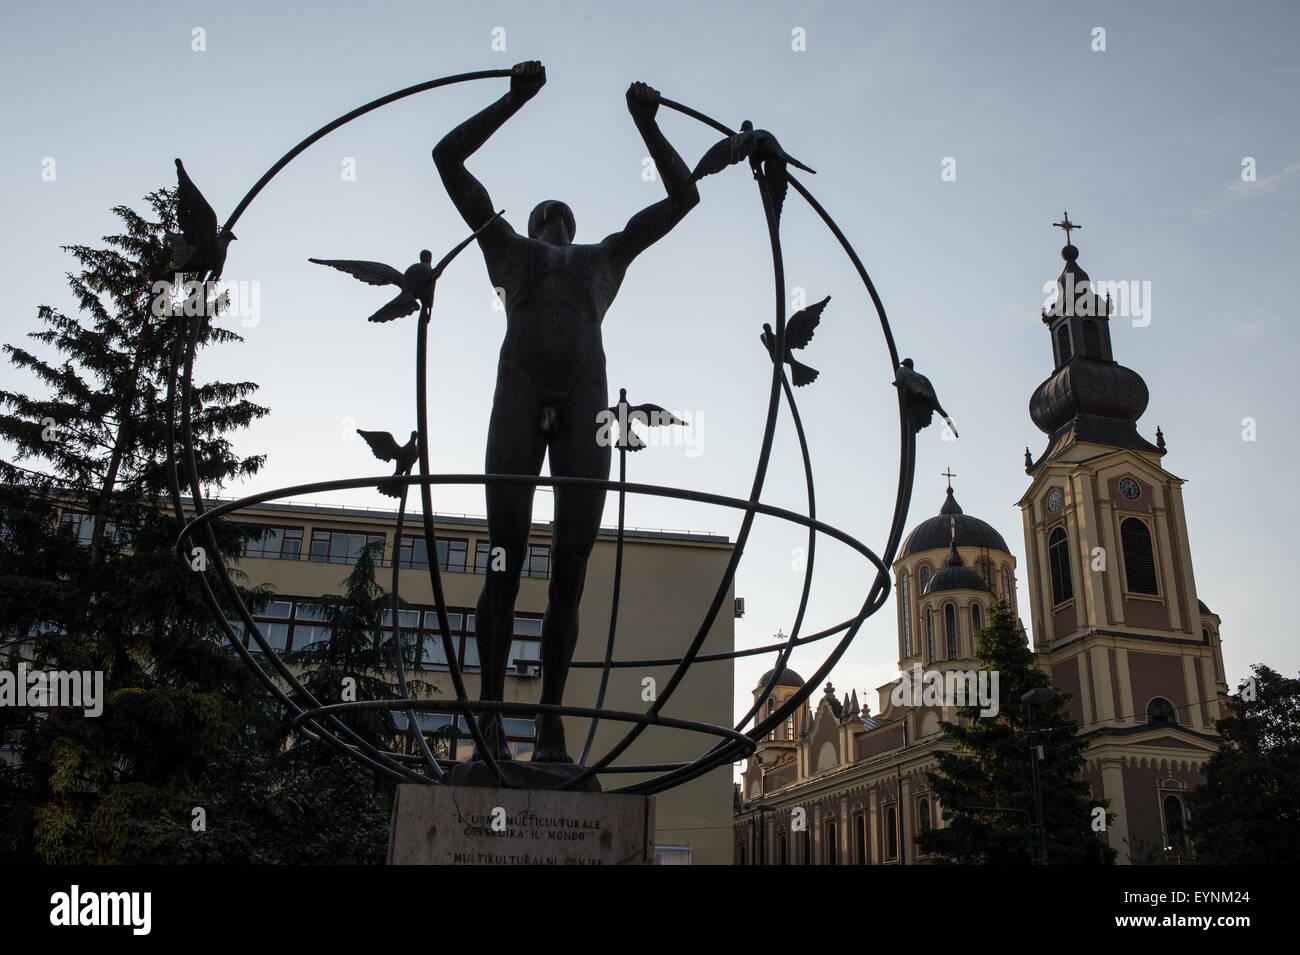 Monument de la paix, Barscarsija district, Sarajevo, Bosnie et Erzegovina Photo Stock